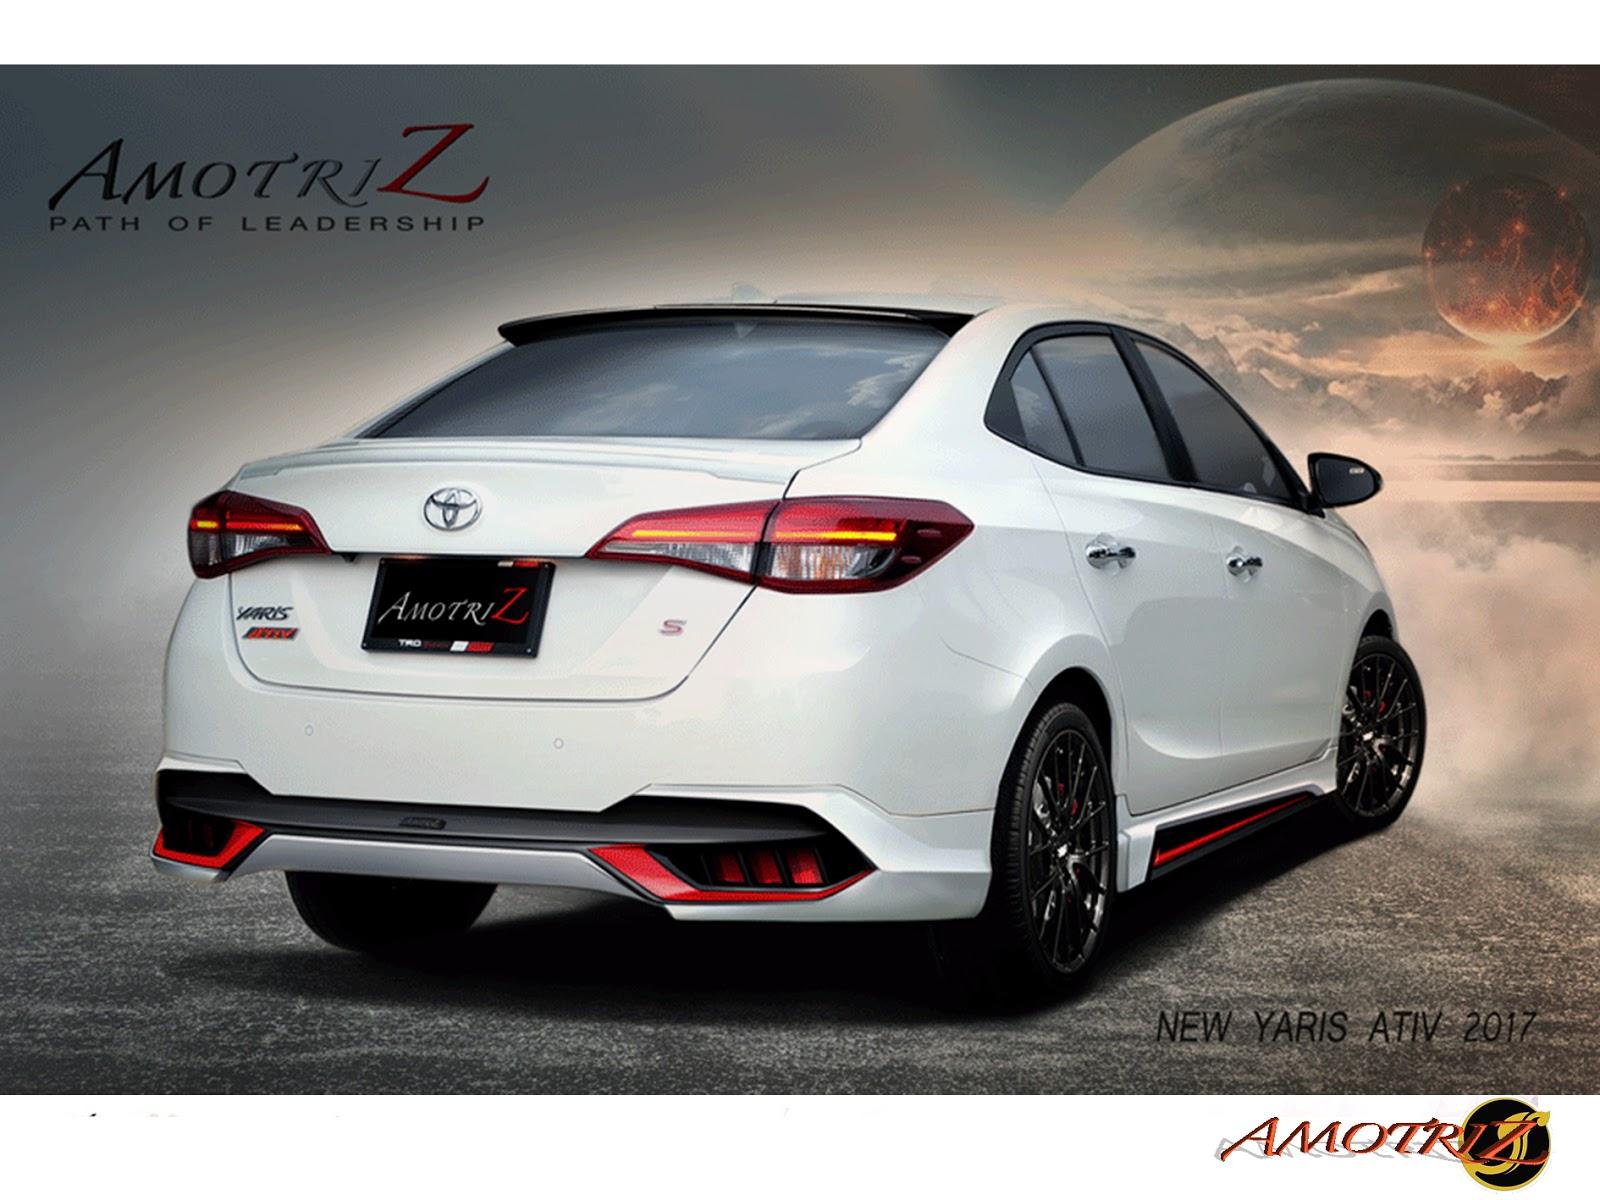 Toyota Yaris Ativ Trd Cara Menyetel Kopling Grand New Avanza ชดแตง Amotriz Bodykits ชดแตงรอบคน